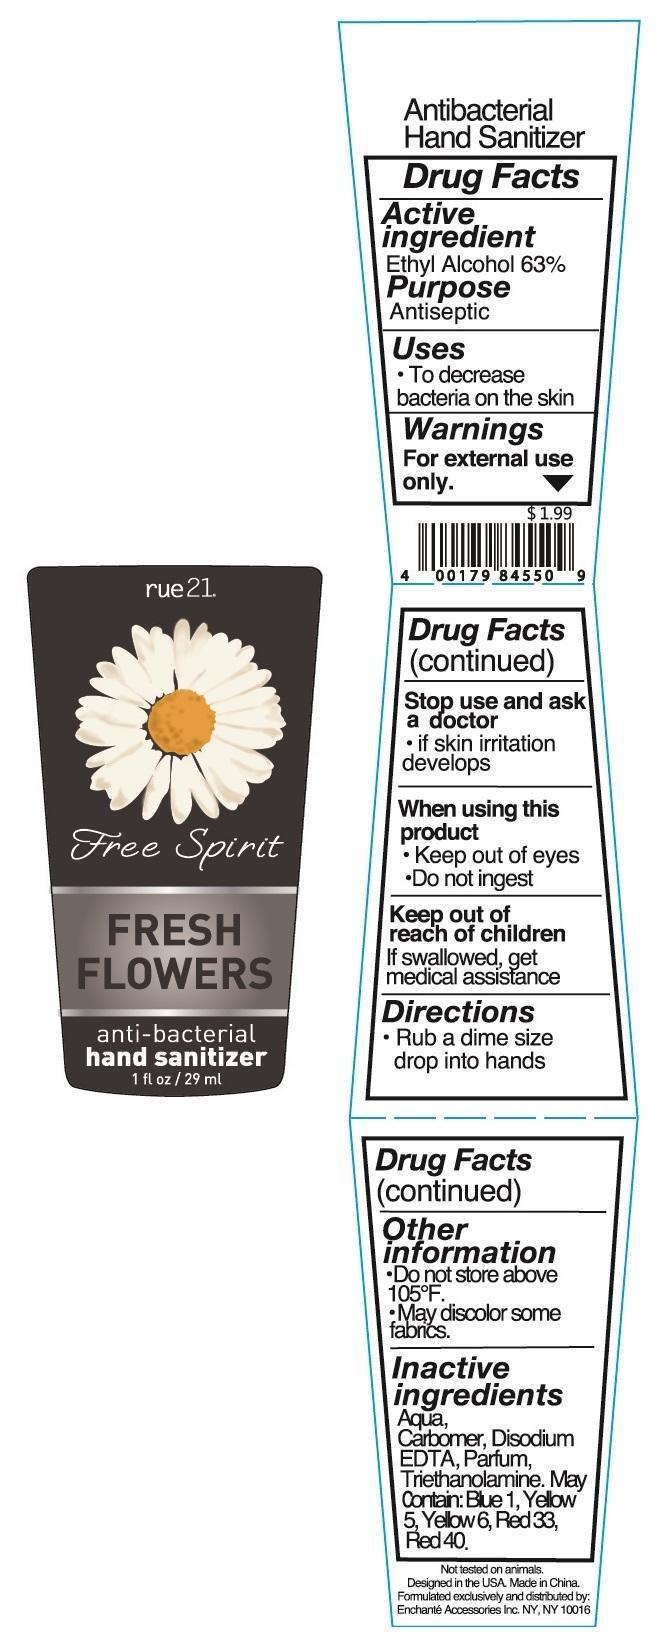 Rue 21 Free Spirit Fresh Flowers Anti Bacterial Hand Sanitizer (Alcohol) Liquid [Enchante Accessories Inc. ]